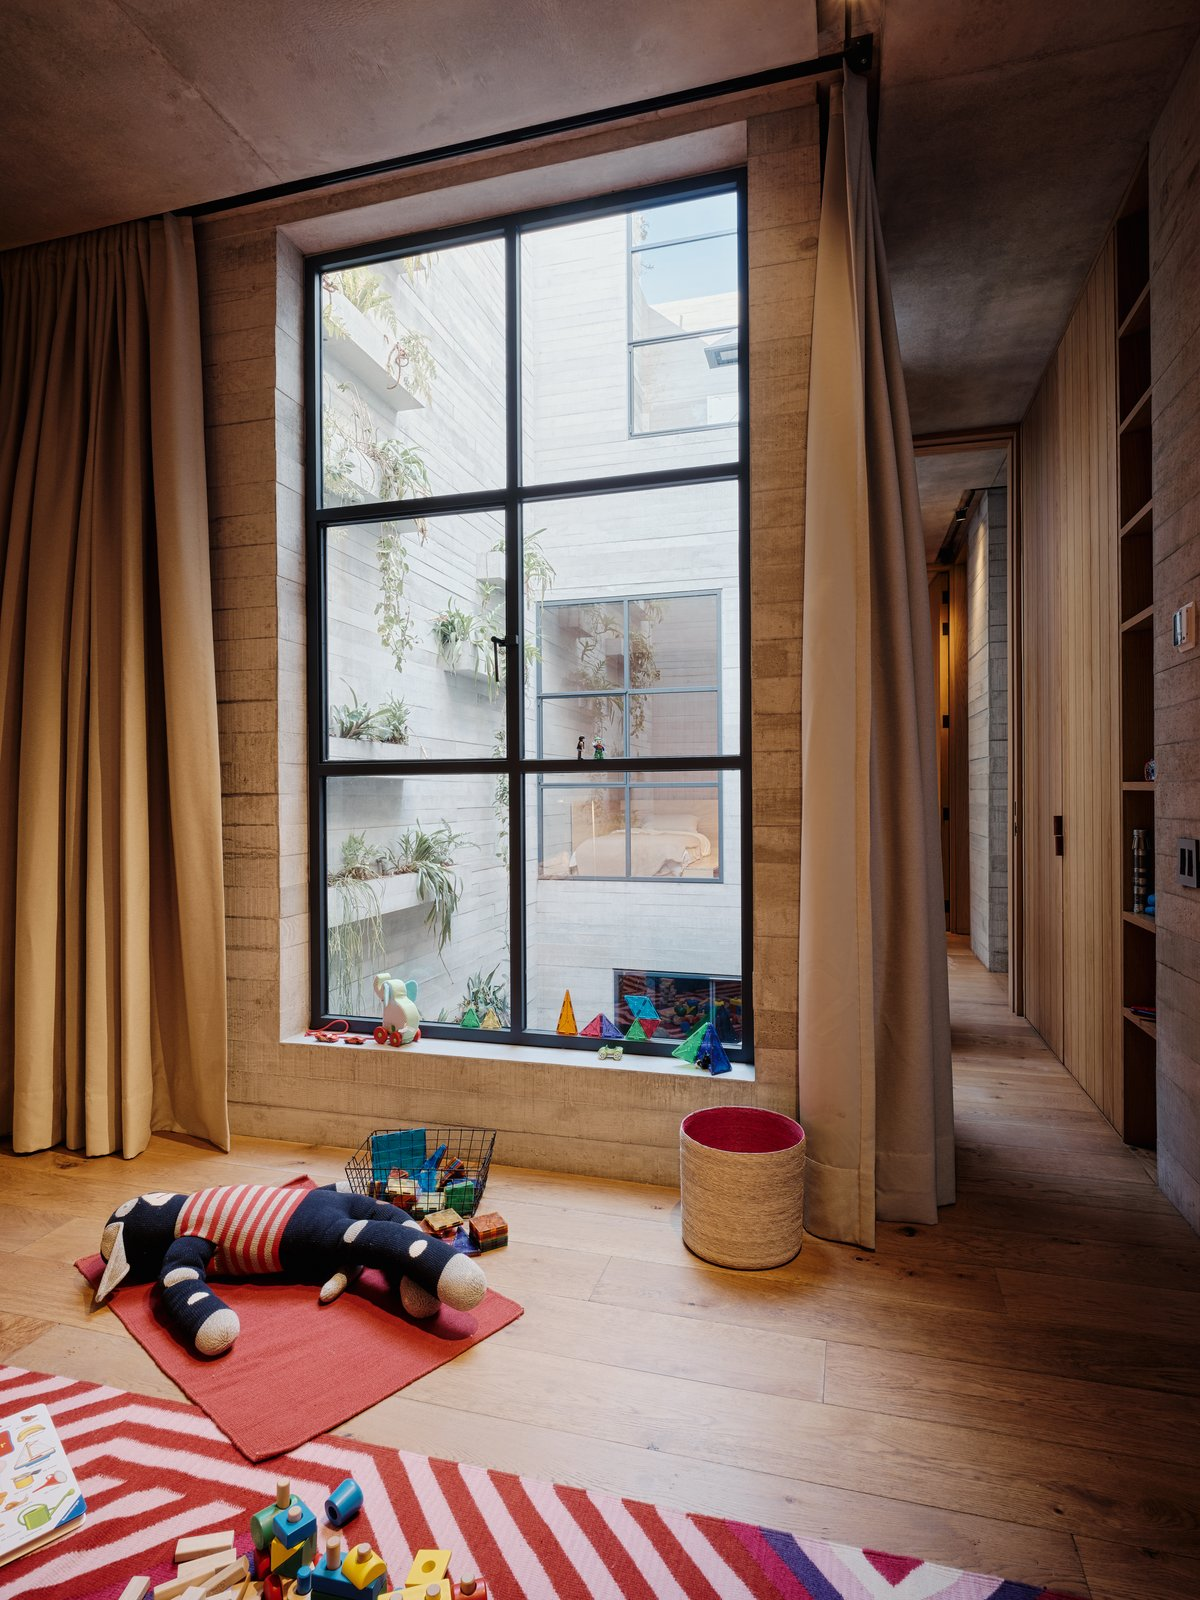 Tennyson 205 Rick Joy Polanco Apartment  kids room